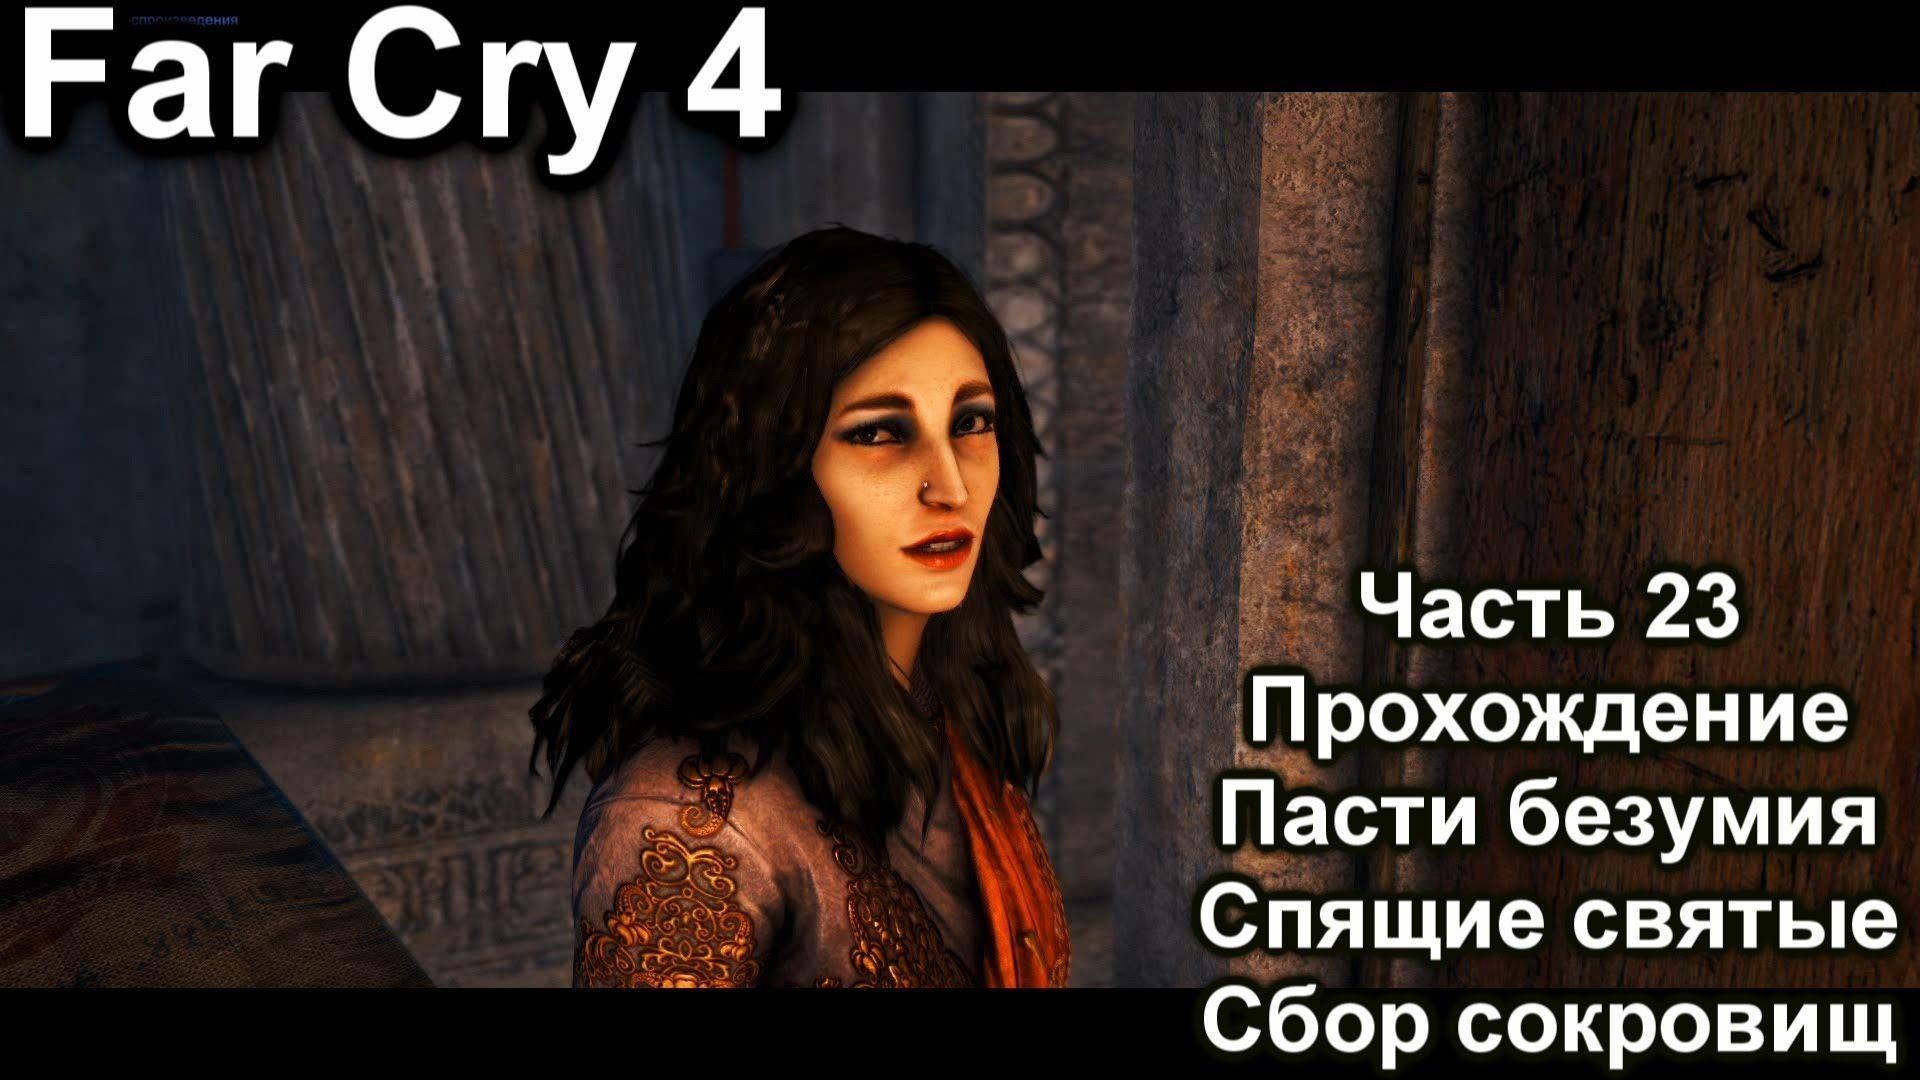 Far cry 4 секс амита